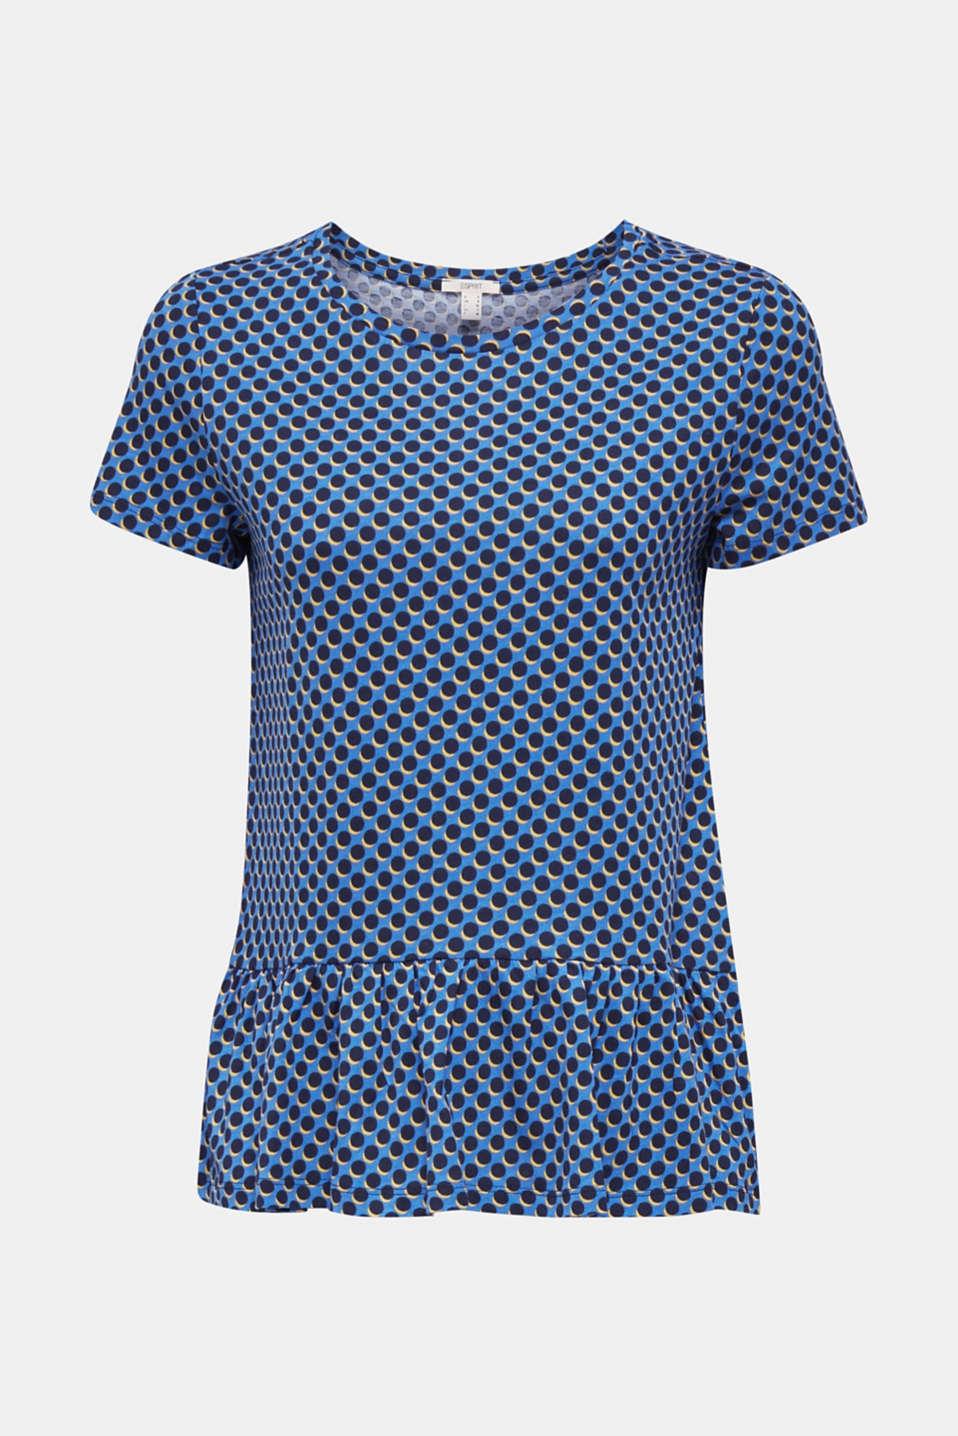 Print T-Shirt with flounce hem, LIGHT BLUE 4, detail image number 5